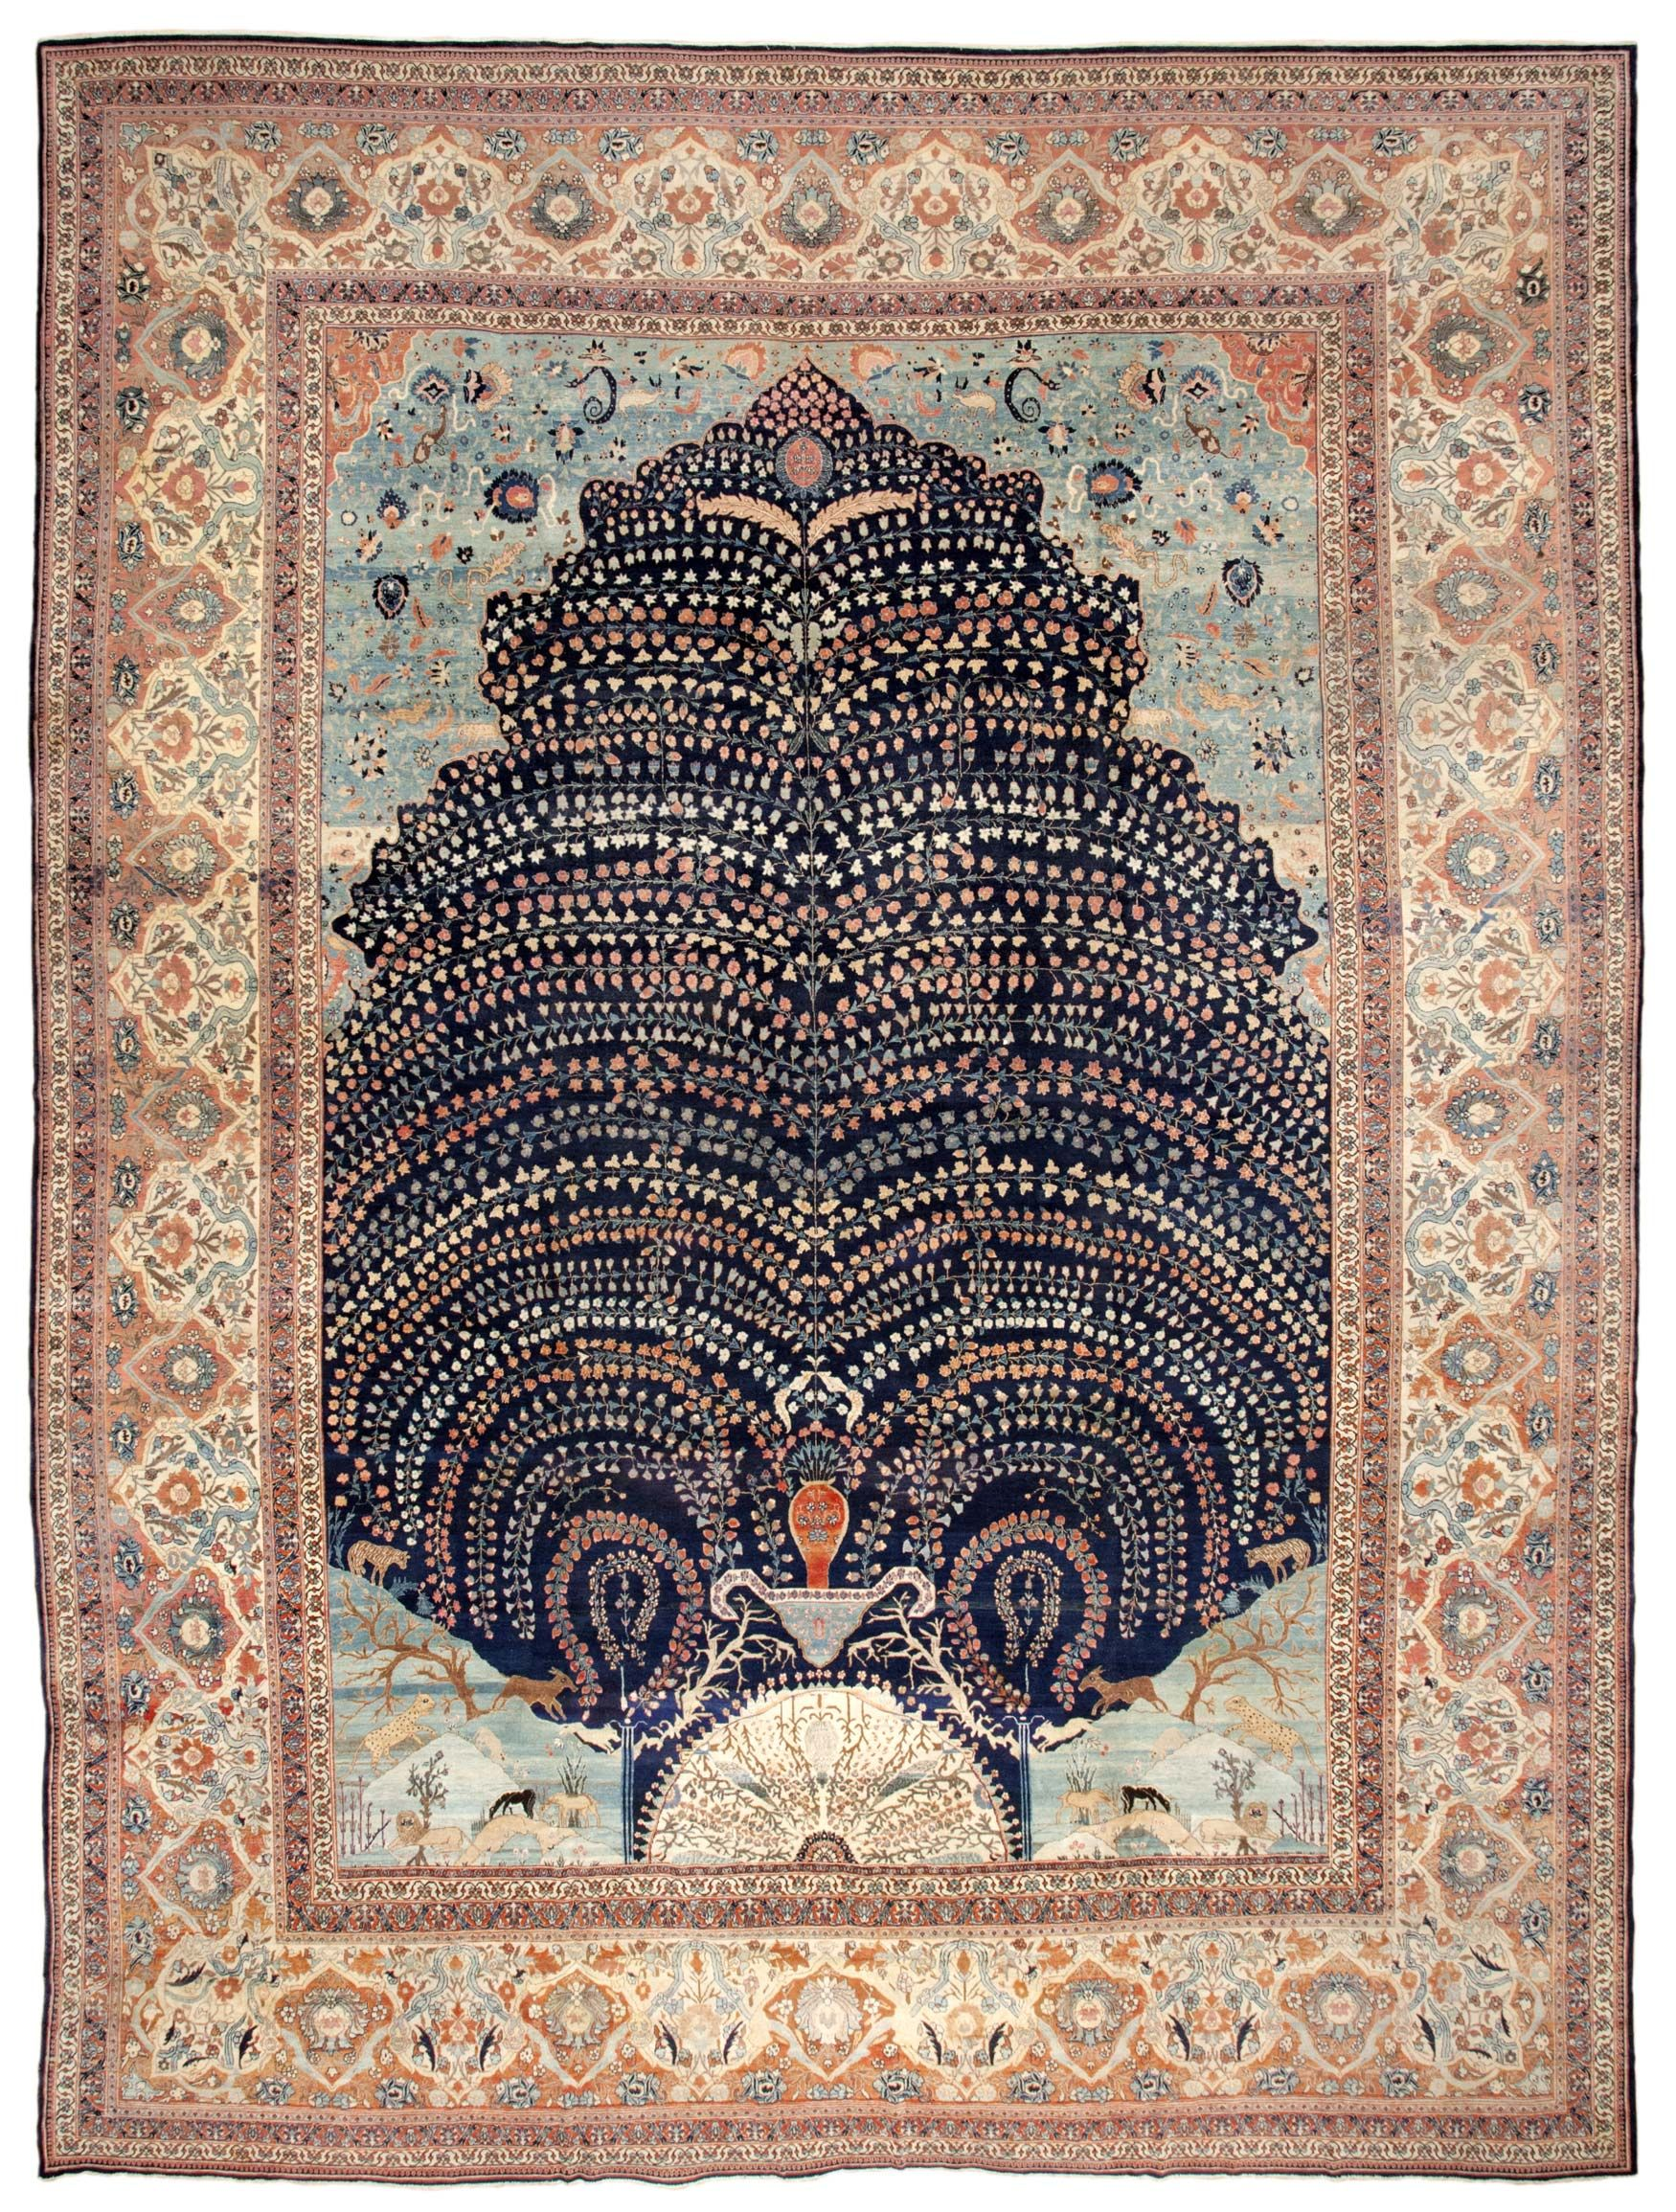 Tabriz Rug Antique Carpet Persian Rugs 44869 By Nazmiyal